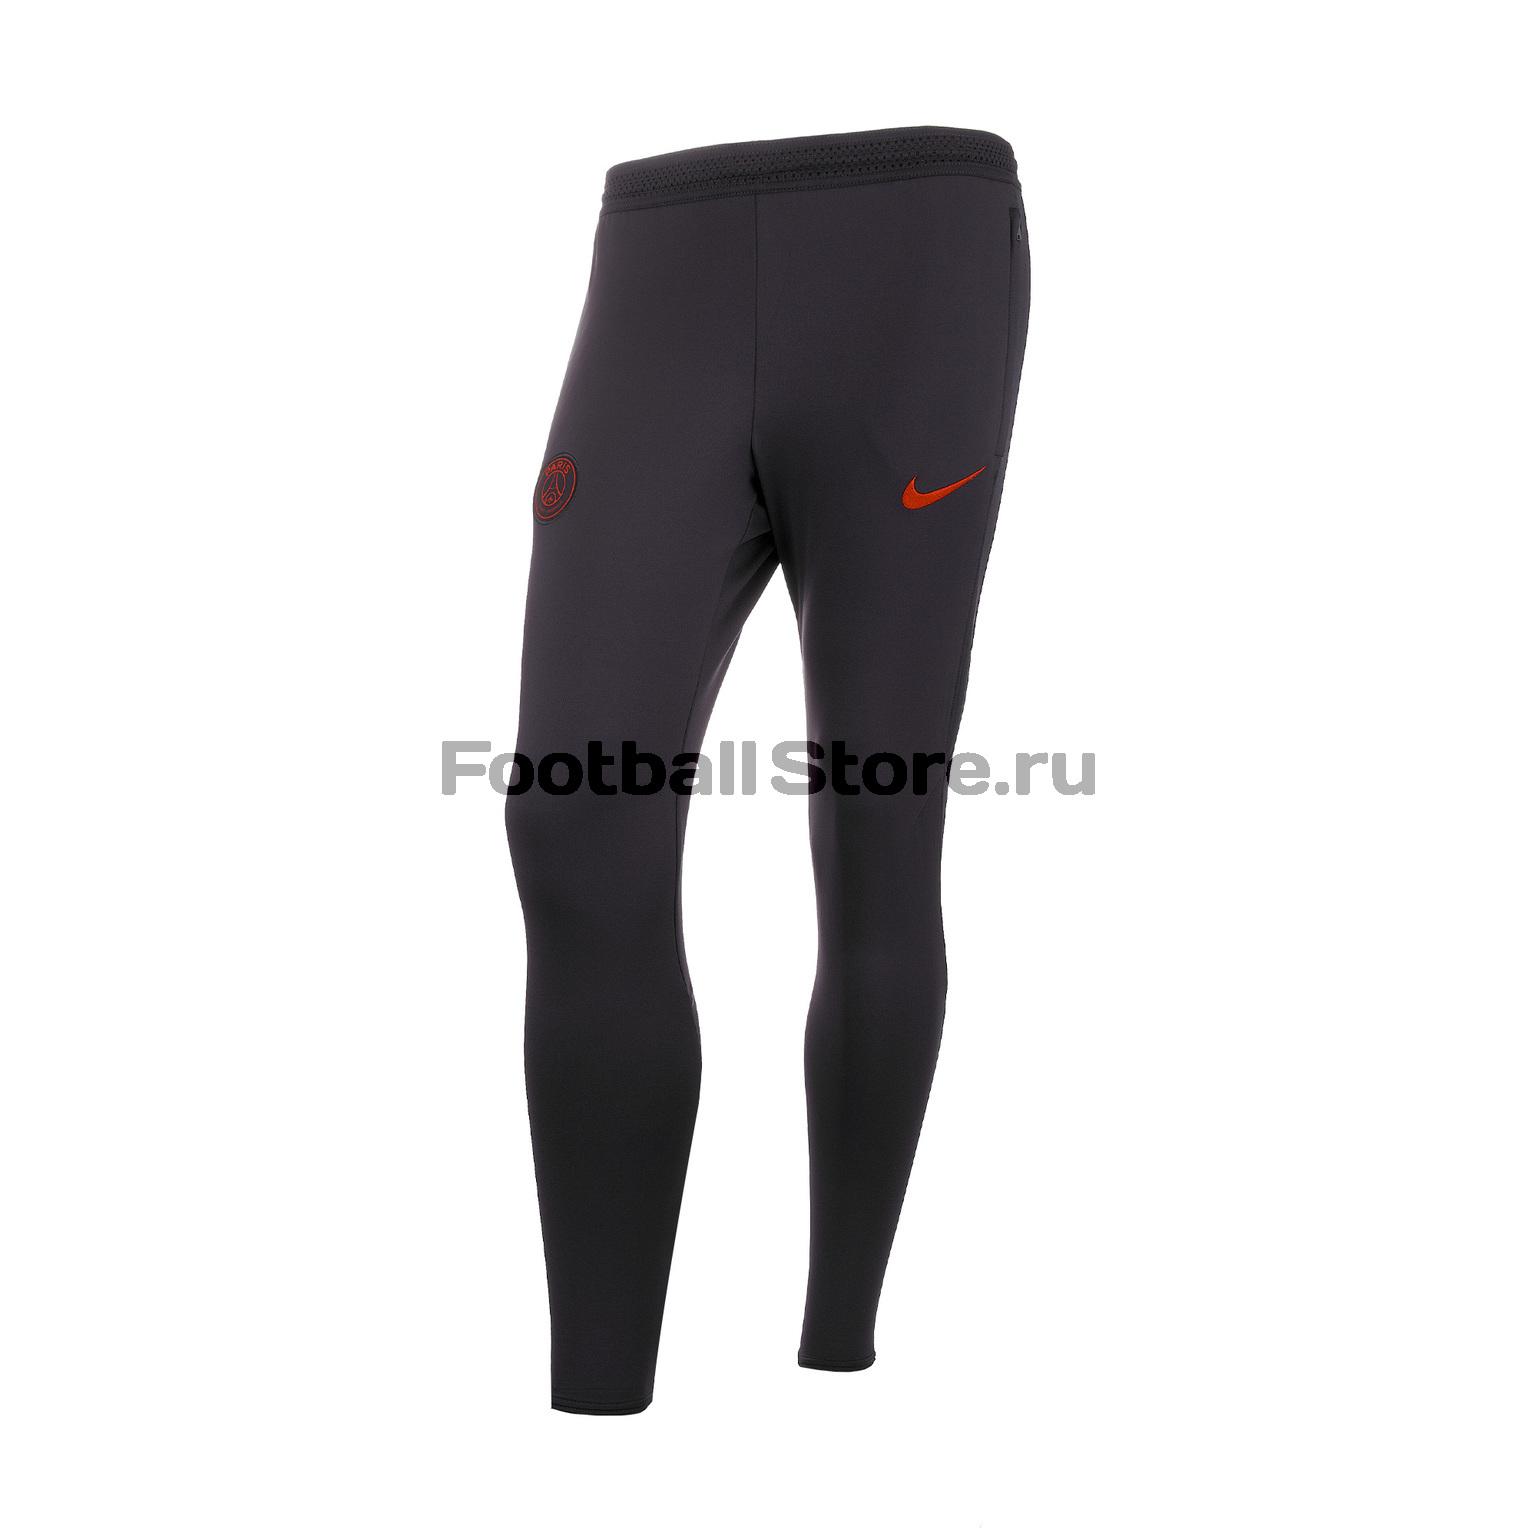 Брюки Nike PSG Dry Strike Pant AO5333-080